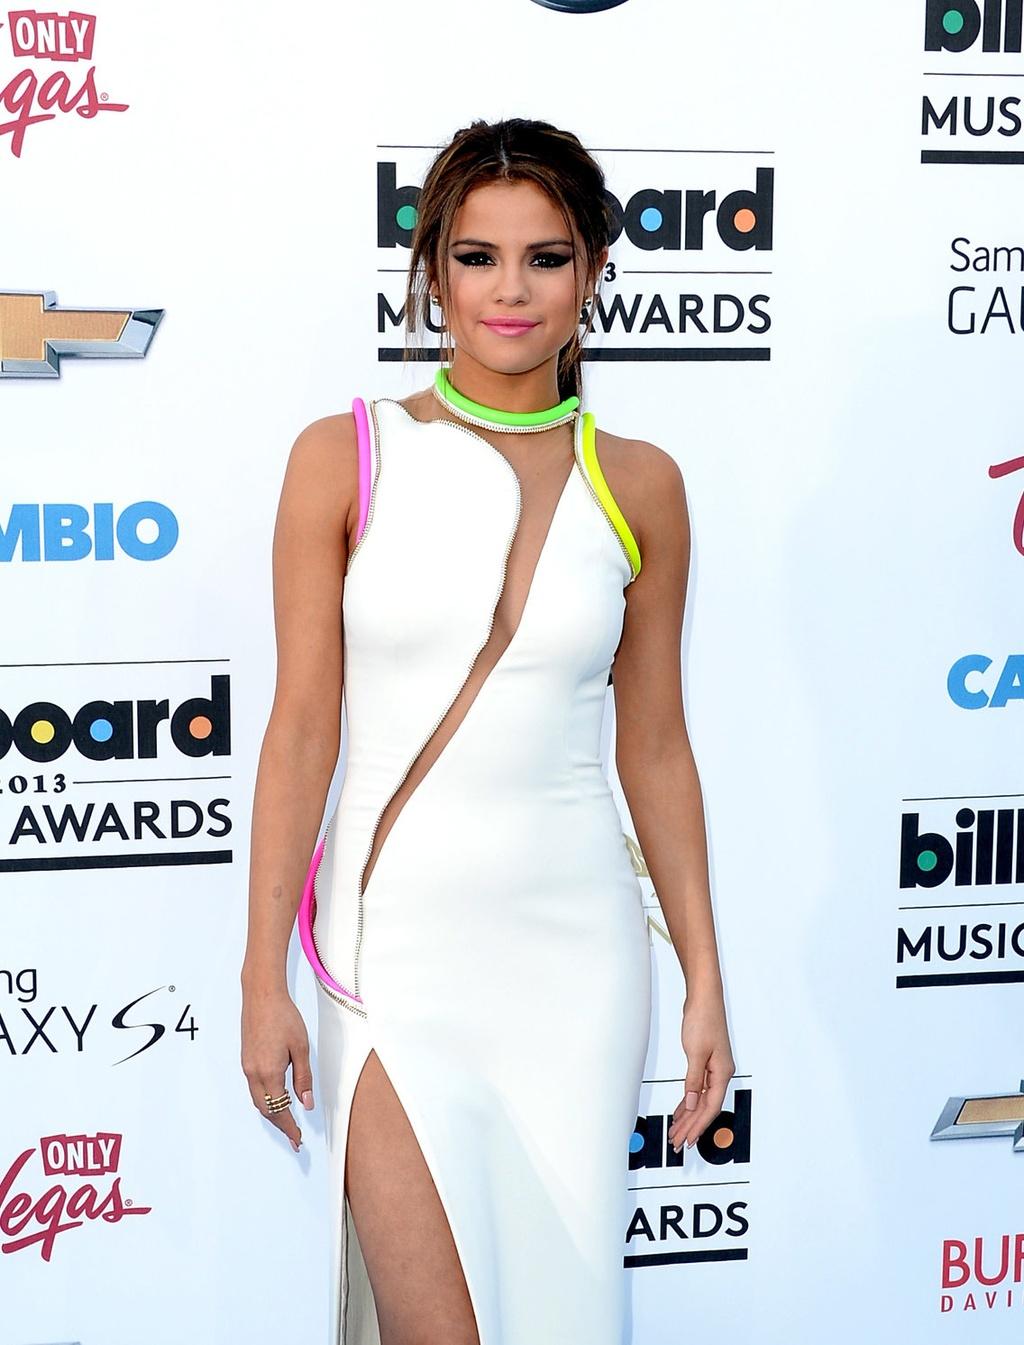 thoi trang qua tung nam cua Selena Gomez anh 8